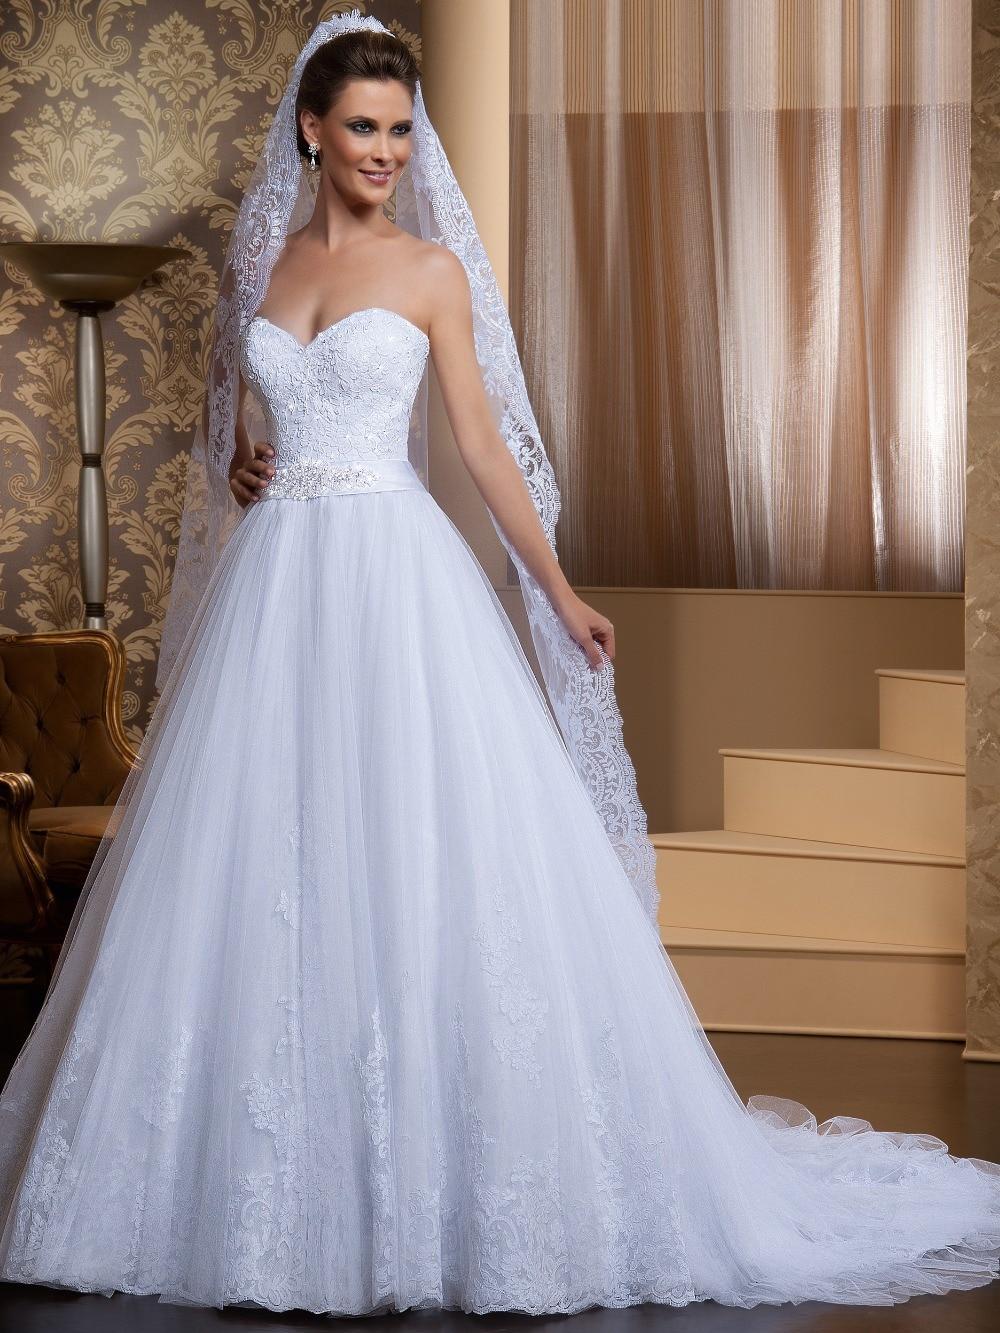 best wedding elegant dresses ideas wedding dresses elegant mesmerizing elegant wedding gowns fancy wedding dresses Great Wedding Elegant Dresses Lace Elegant Wedding Dresses Ocodea